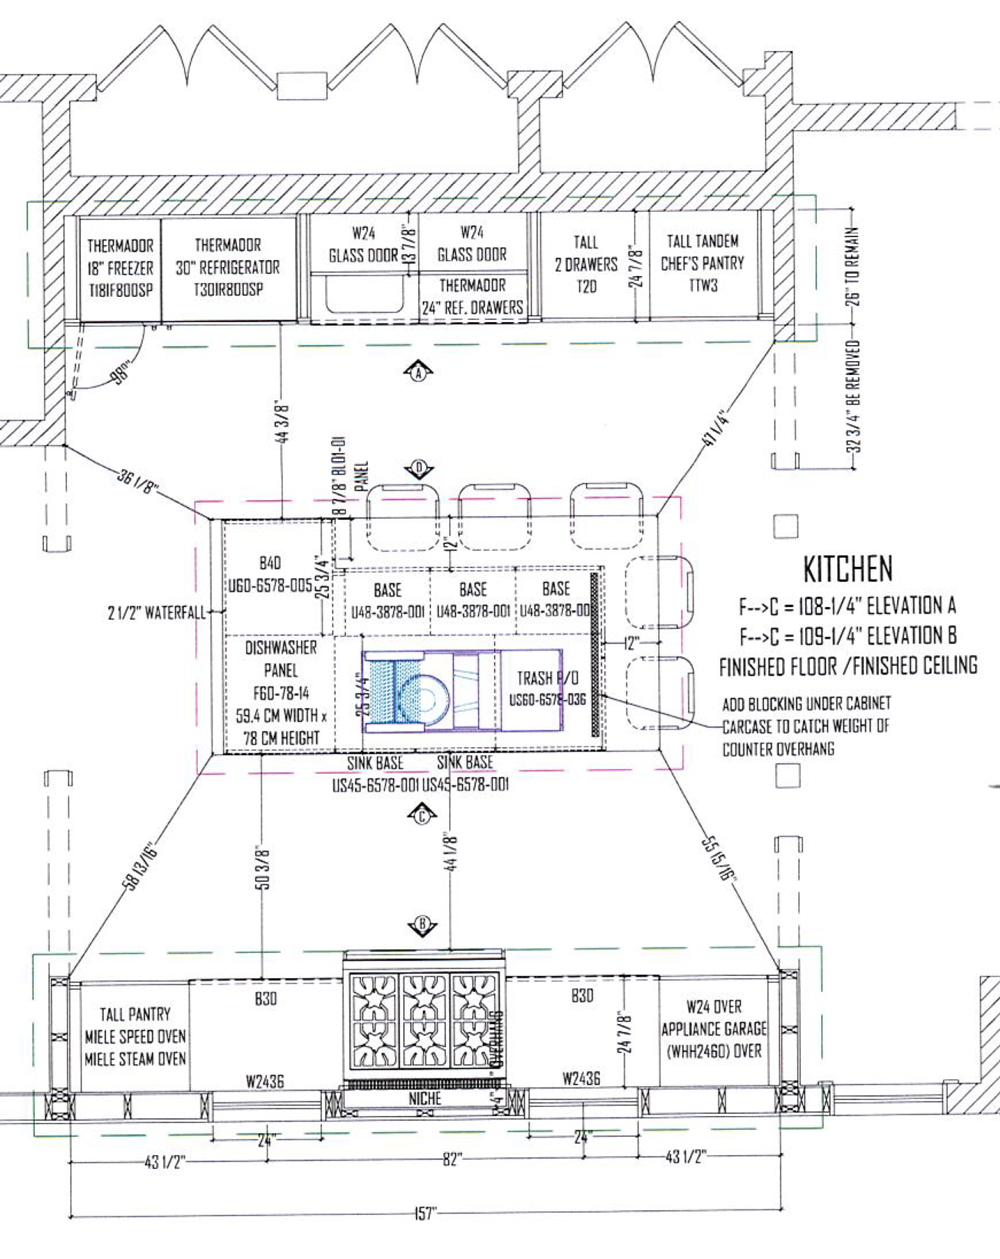 Sharon-Kory-Kitchen-Blueprint